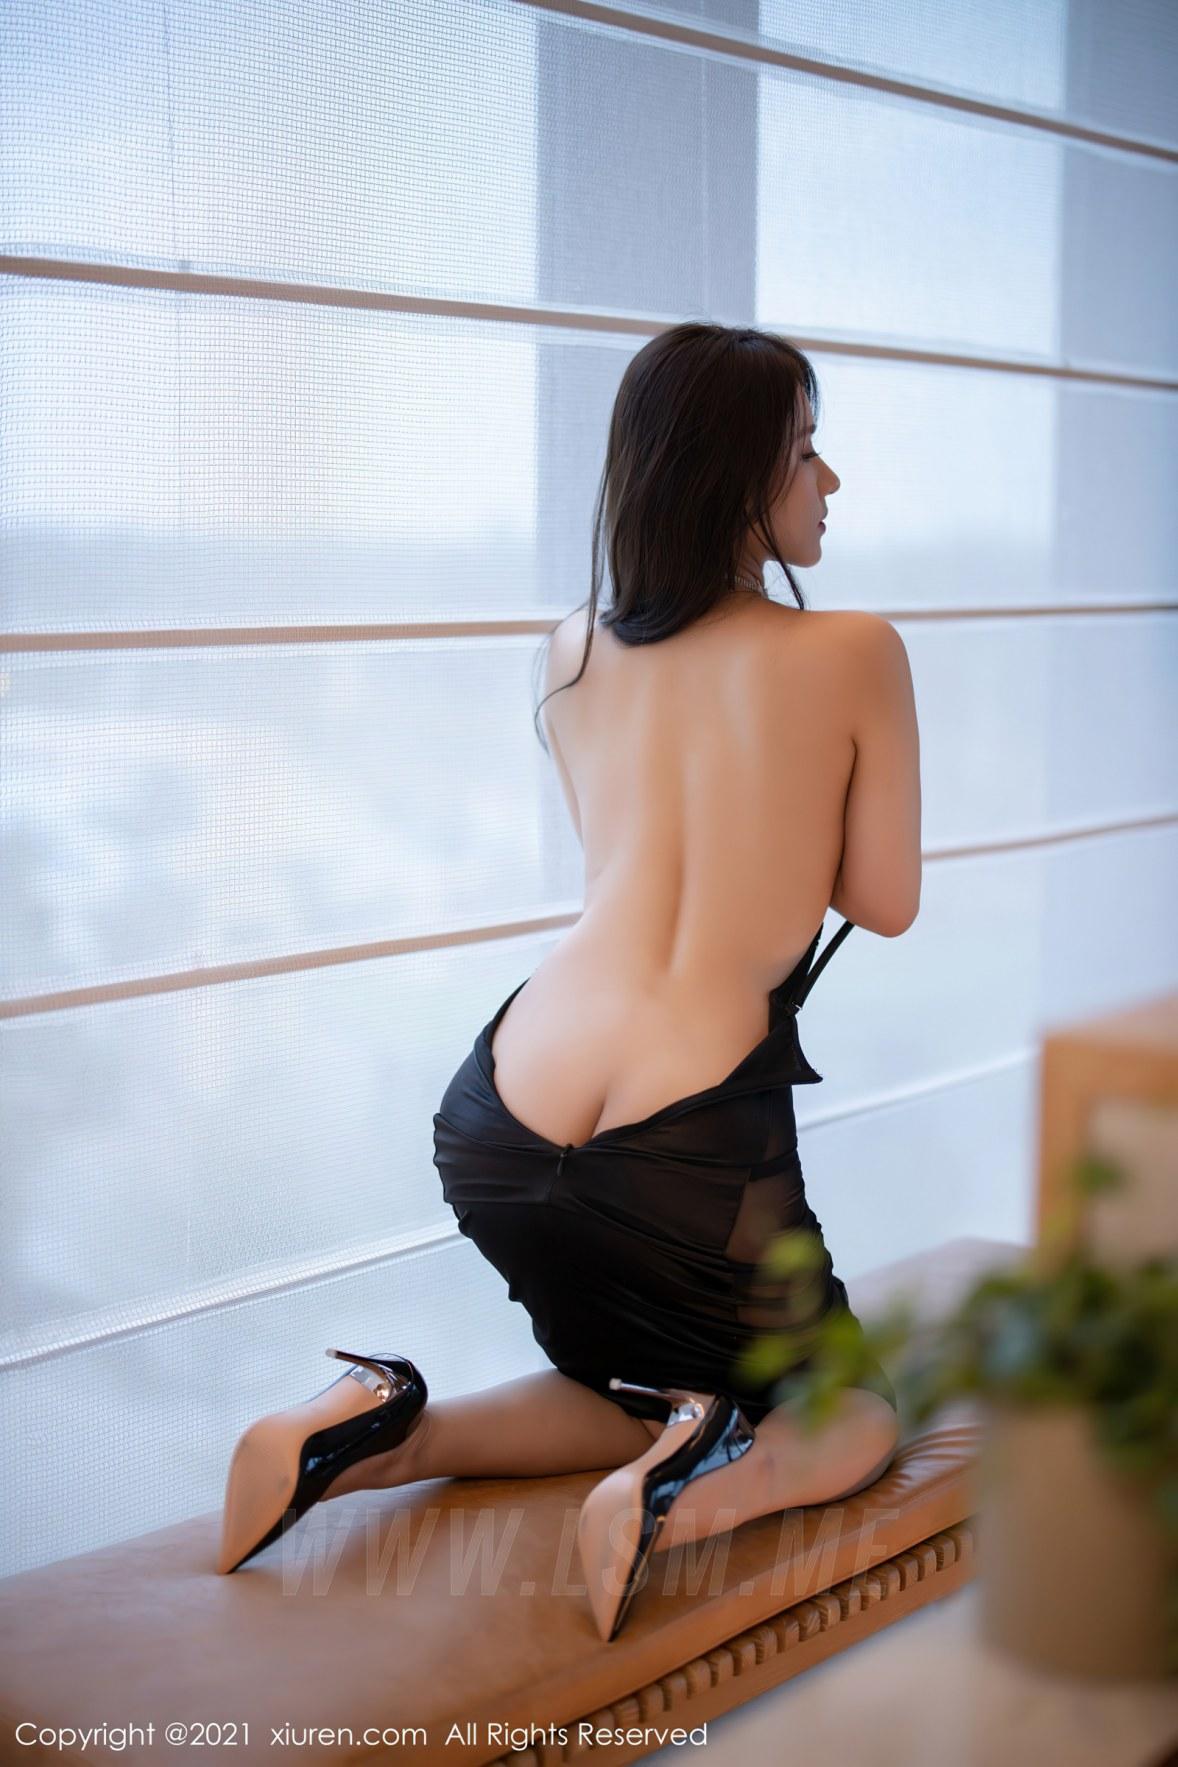 3465 036 evz 3600 5400 - XiuRen 秀人 No.3465  黑色吊裙 徐安安 三亚旅拍写真 - 秀人网 -【免费在线写真】【丽人丝语】